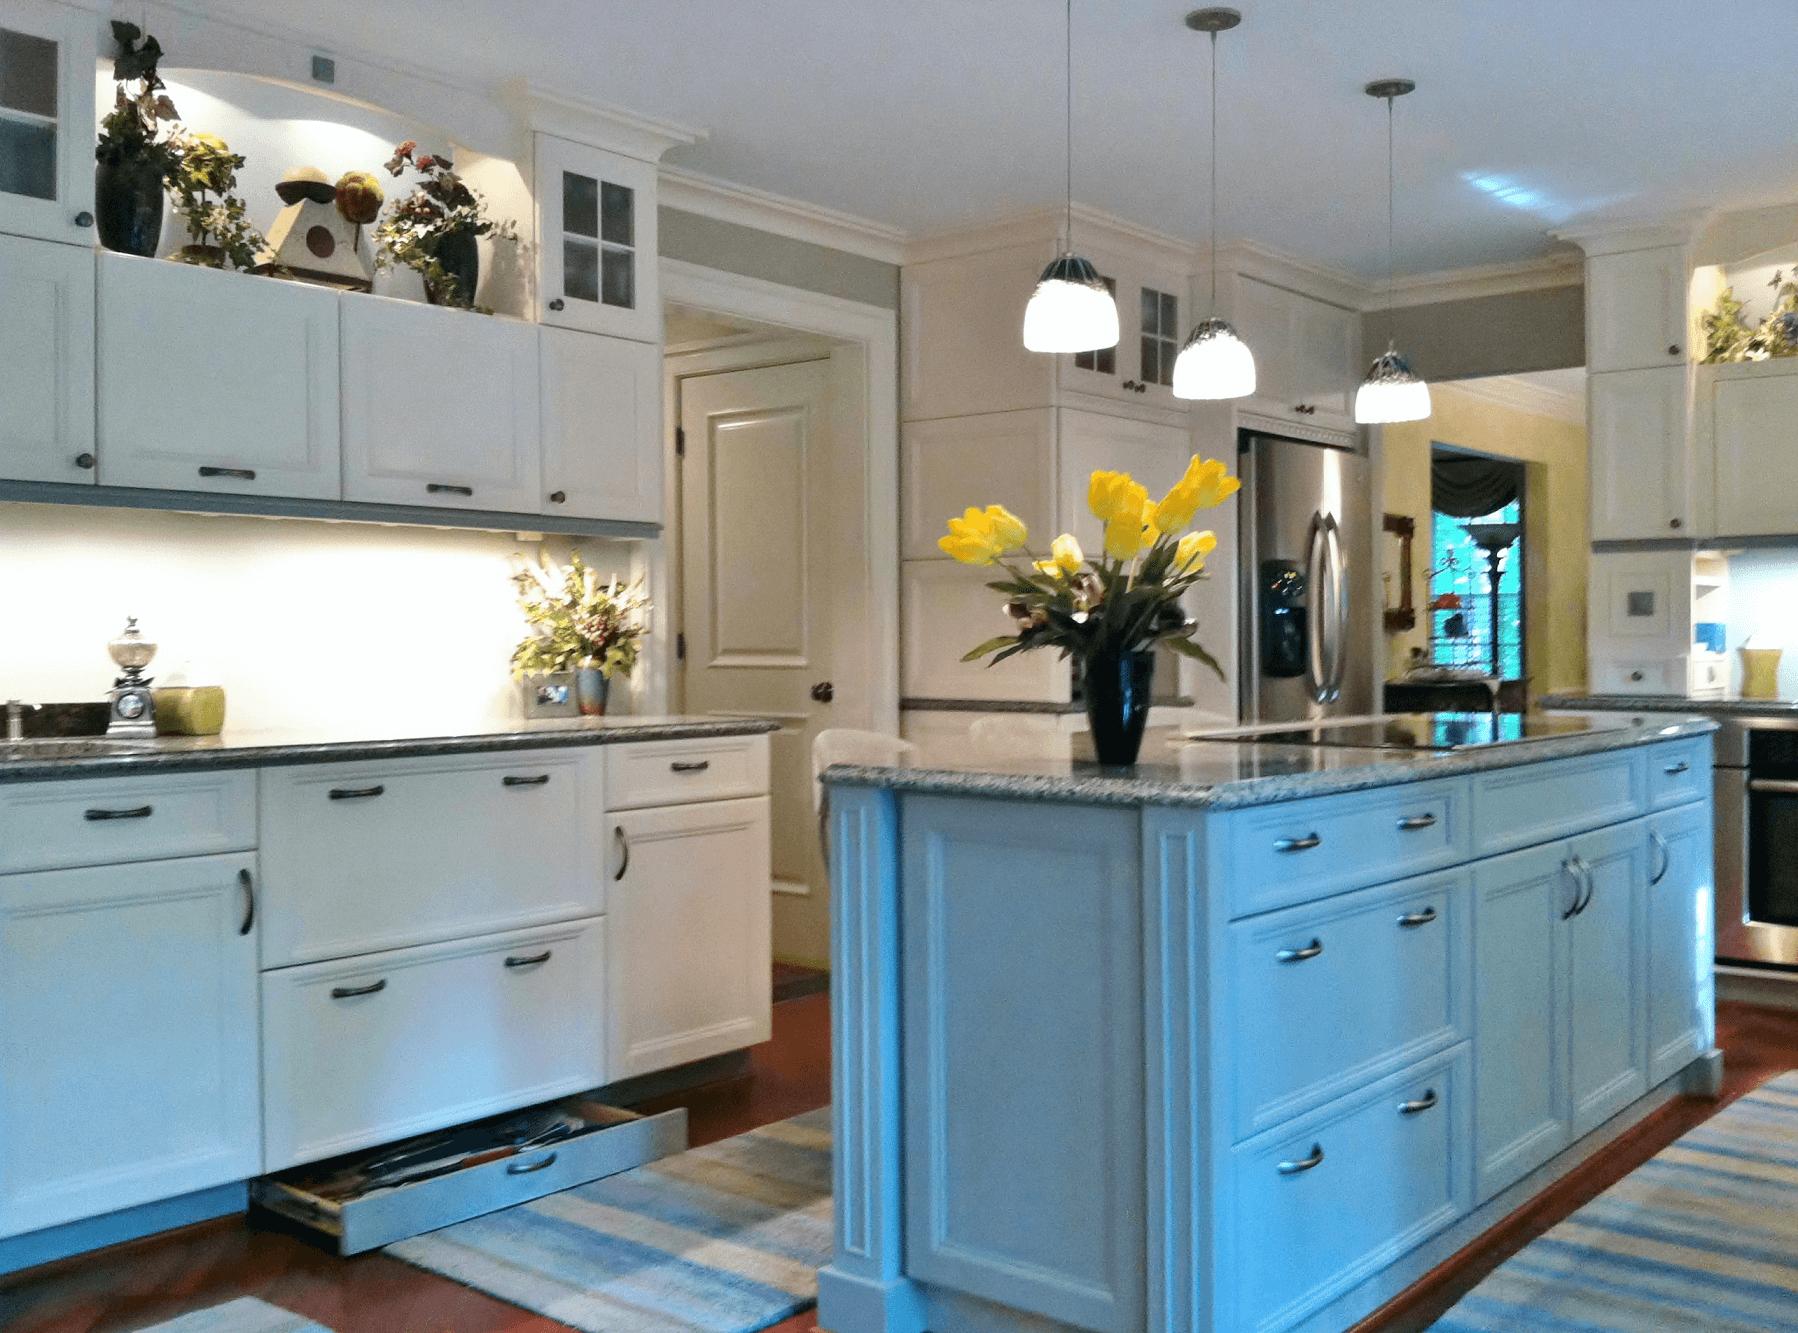 kitchen cabinet toe kick ideas | Kitchen | Pinterest | Kitchens